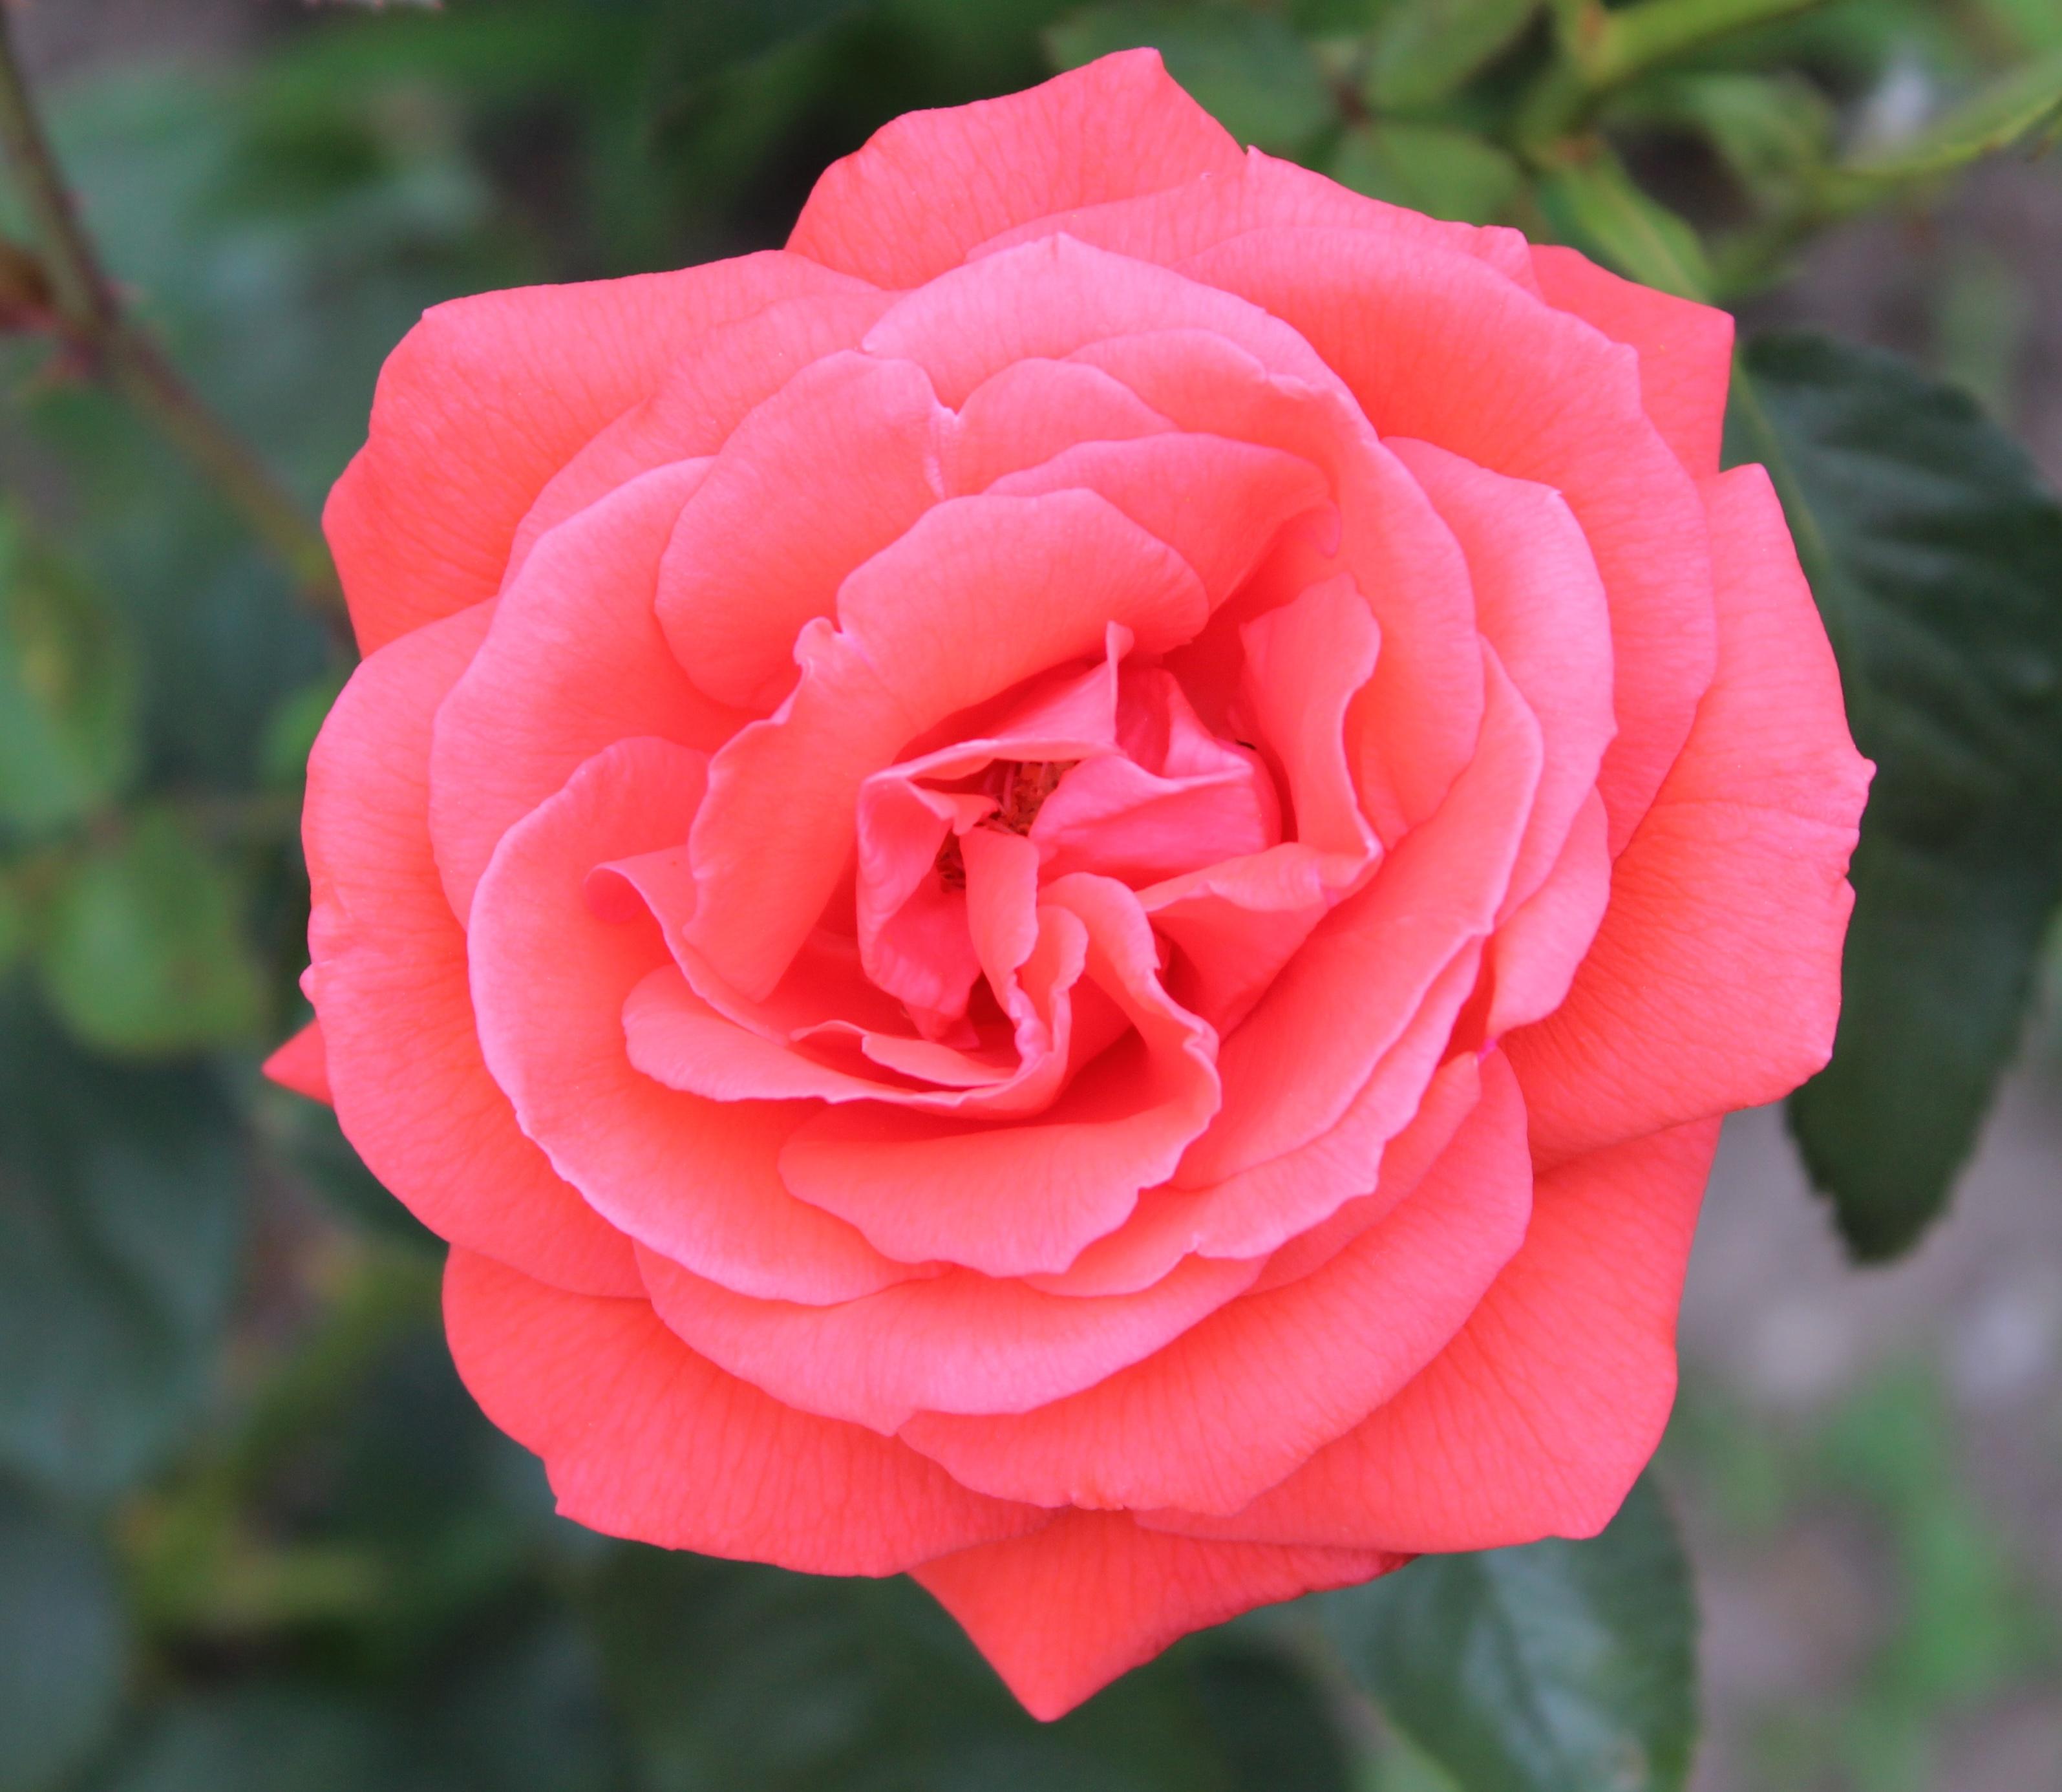 roses - photo #15